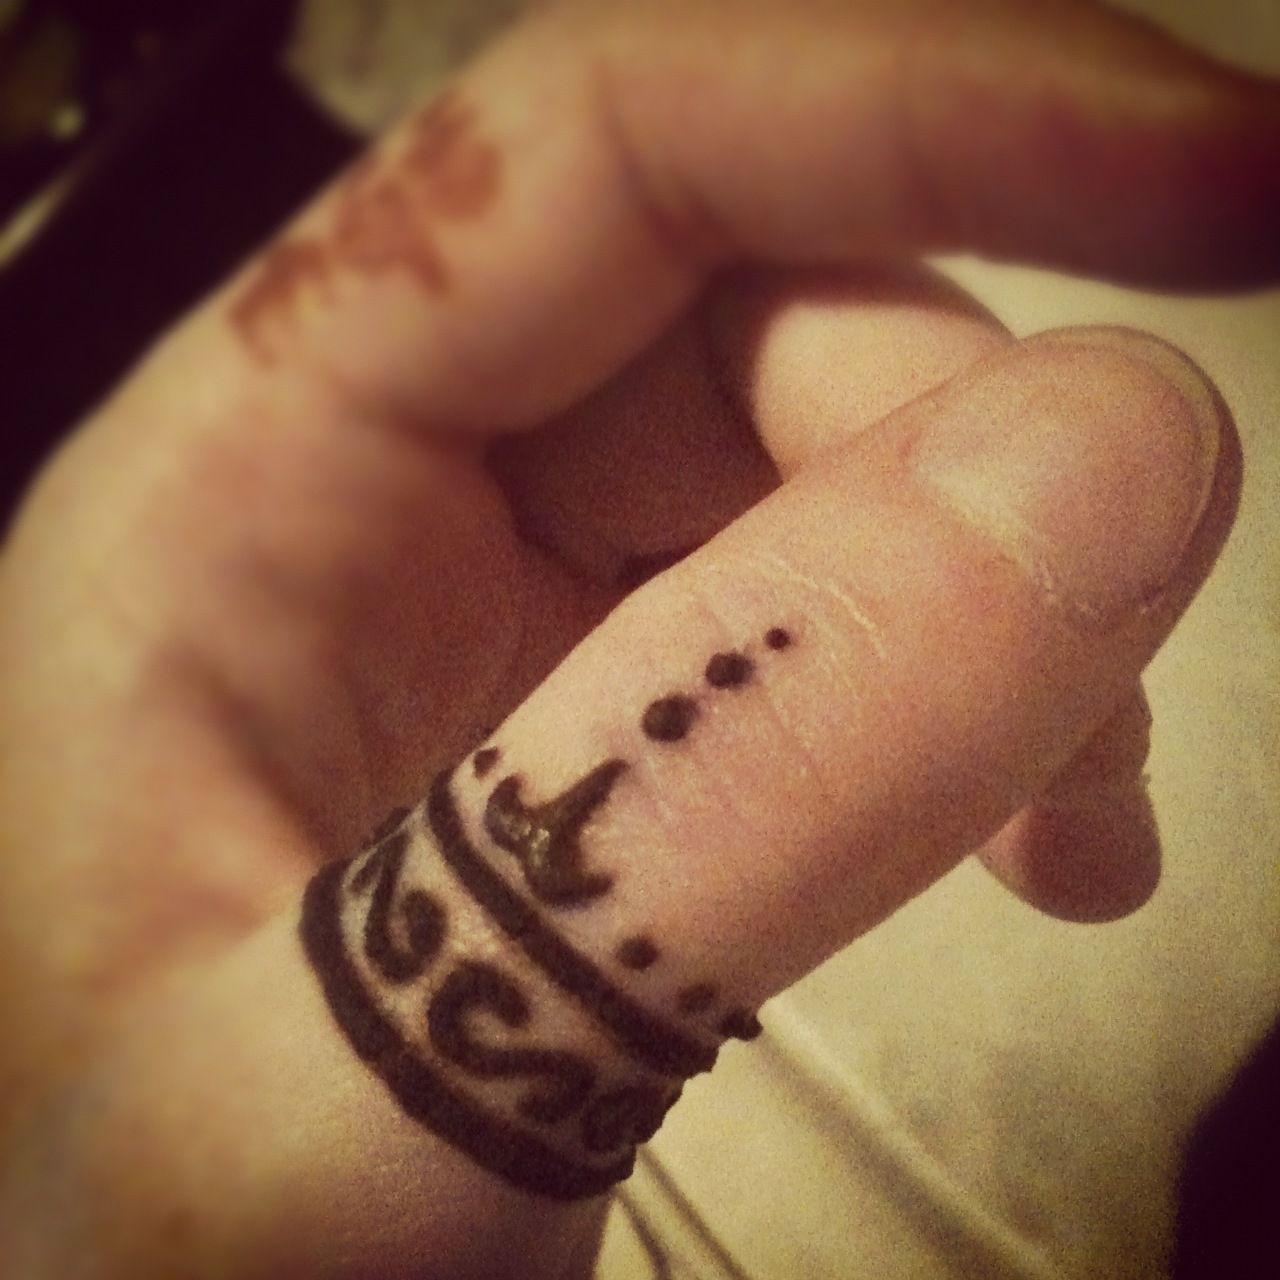 Henna Tattoo Ring Designs: Henna Thumb Ring Design And Elvish Tengwar Script Author J